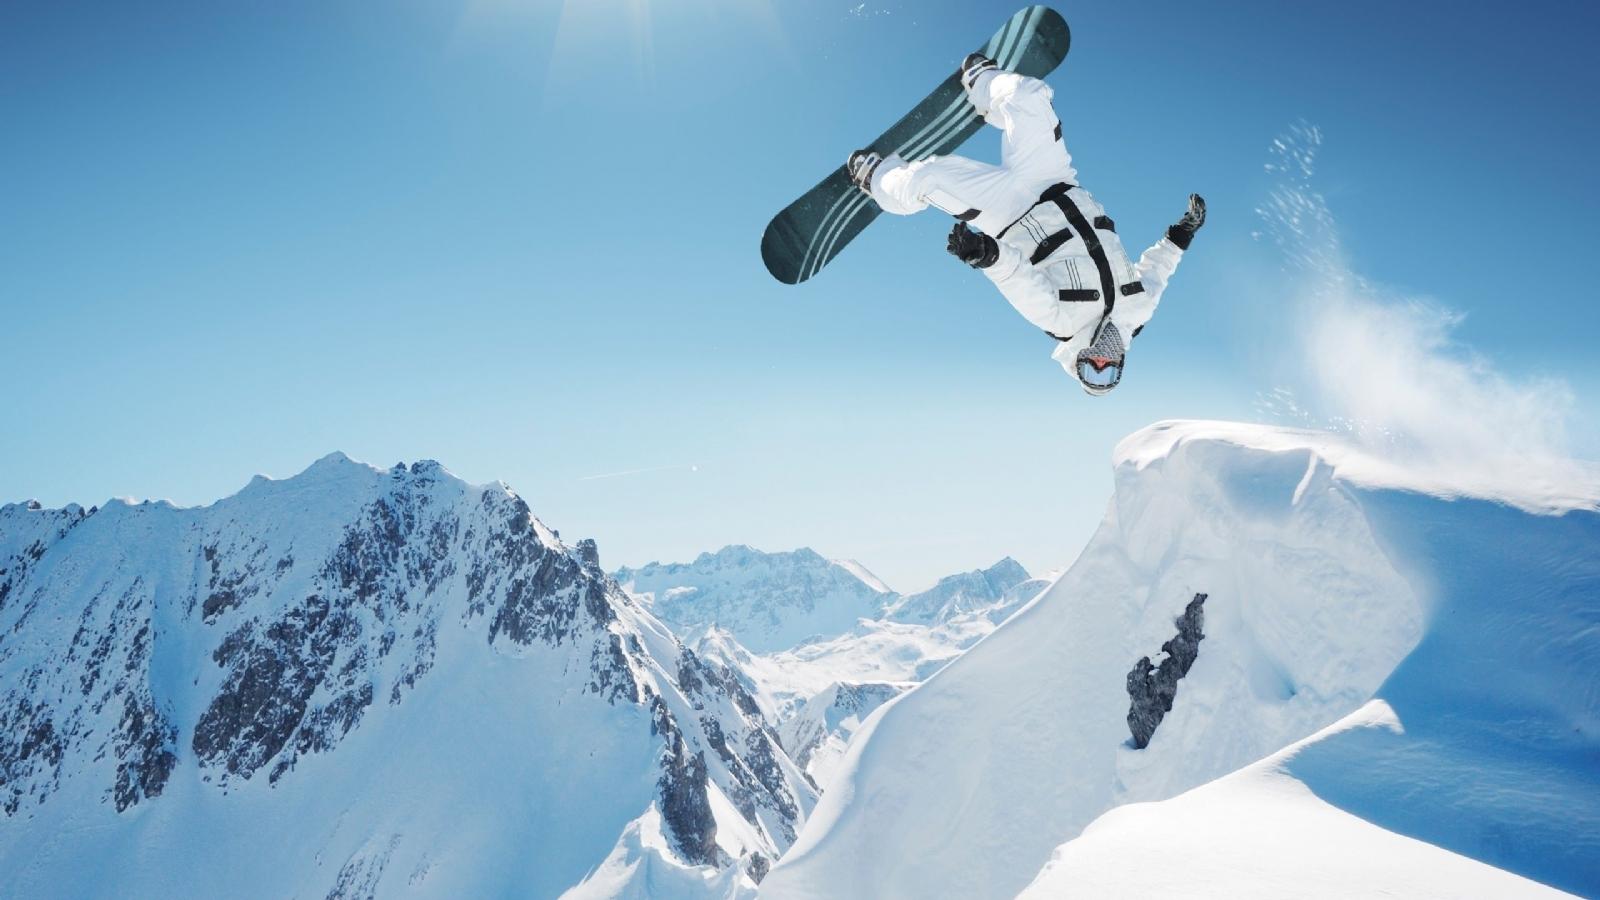 http://1.bp.blogspot.com/-2rYL7cRlOa0/Tw0mQ3Nd_8I/AAAAAAAABTY/TLxOFx05blA/s1600/Snowboarding+Wallpaper+1.jpg